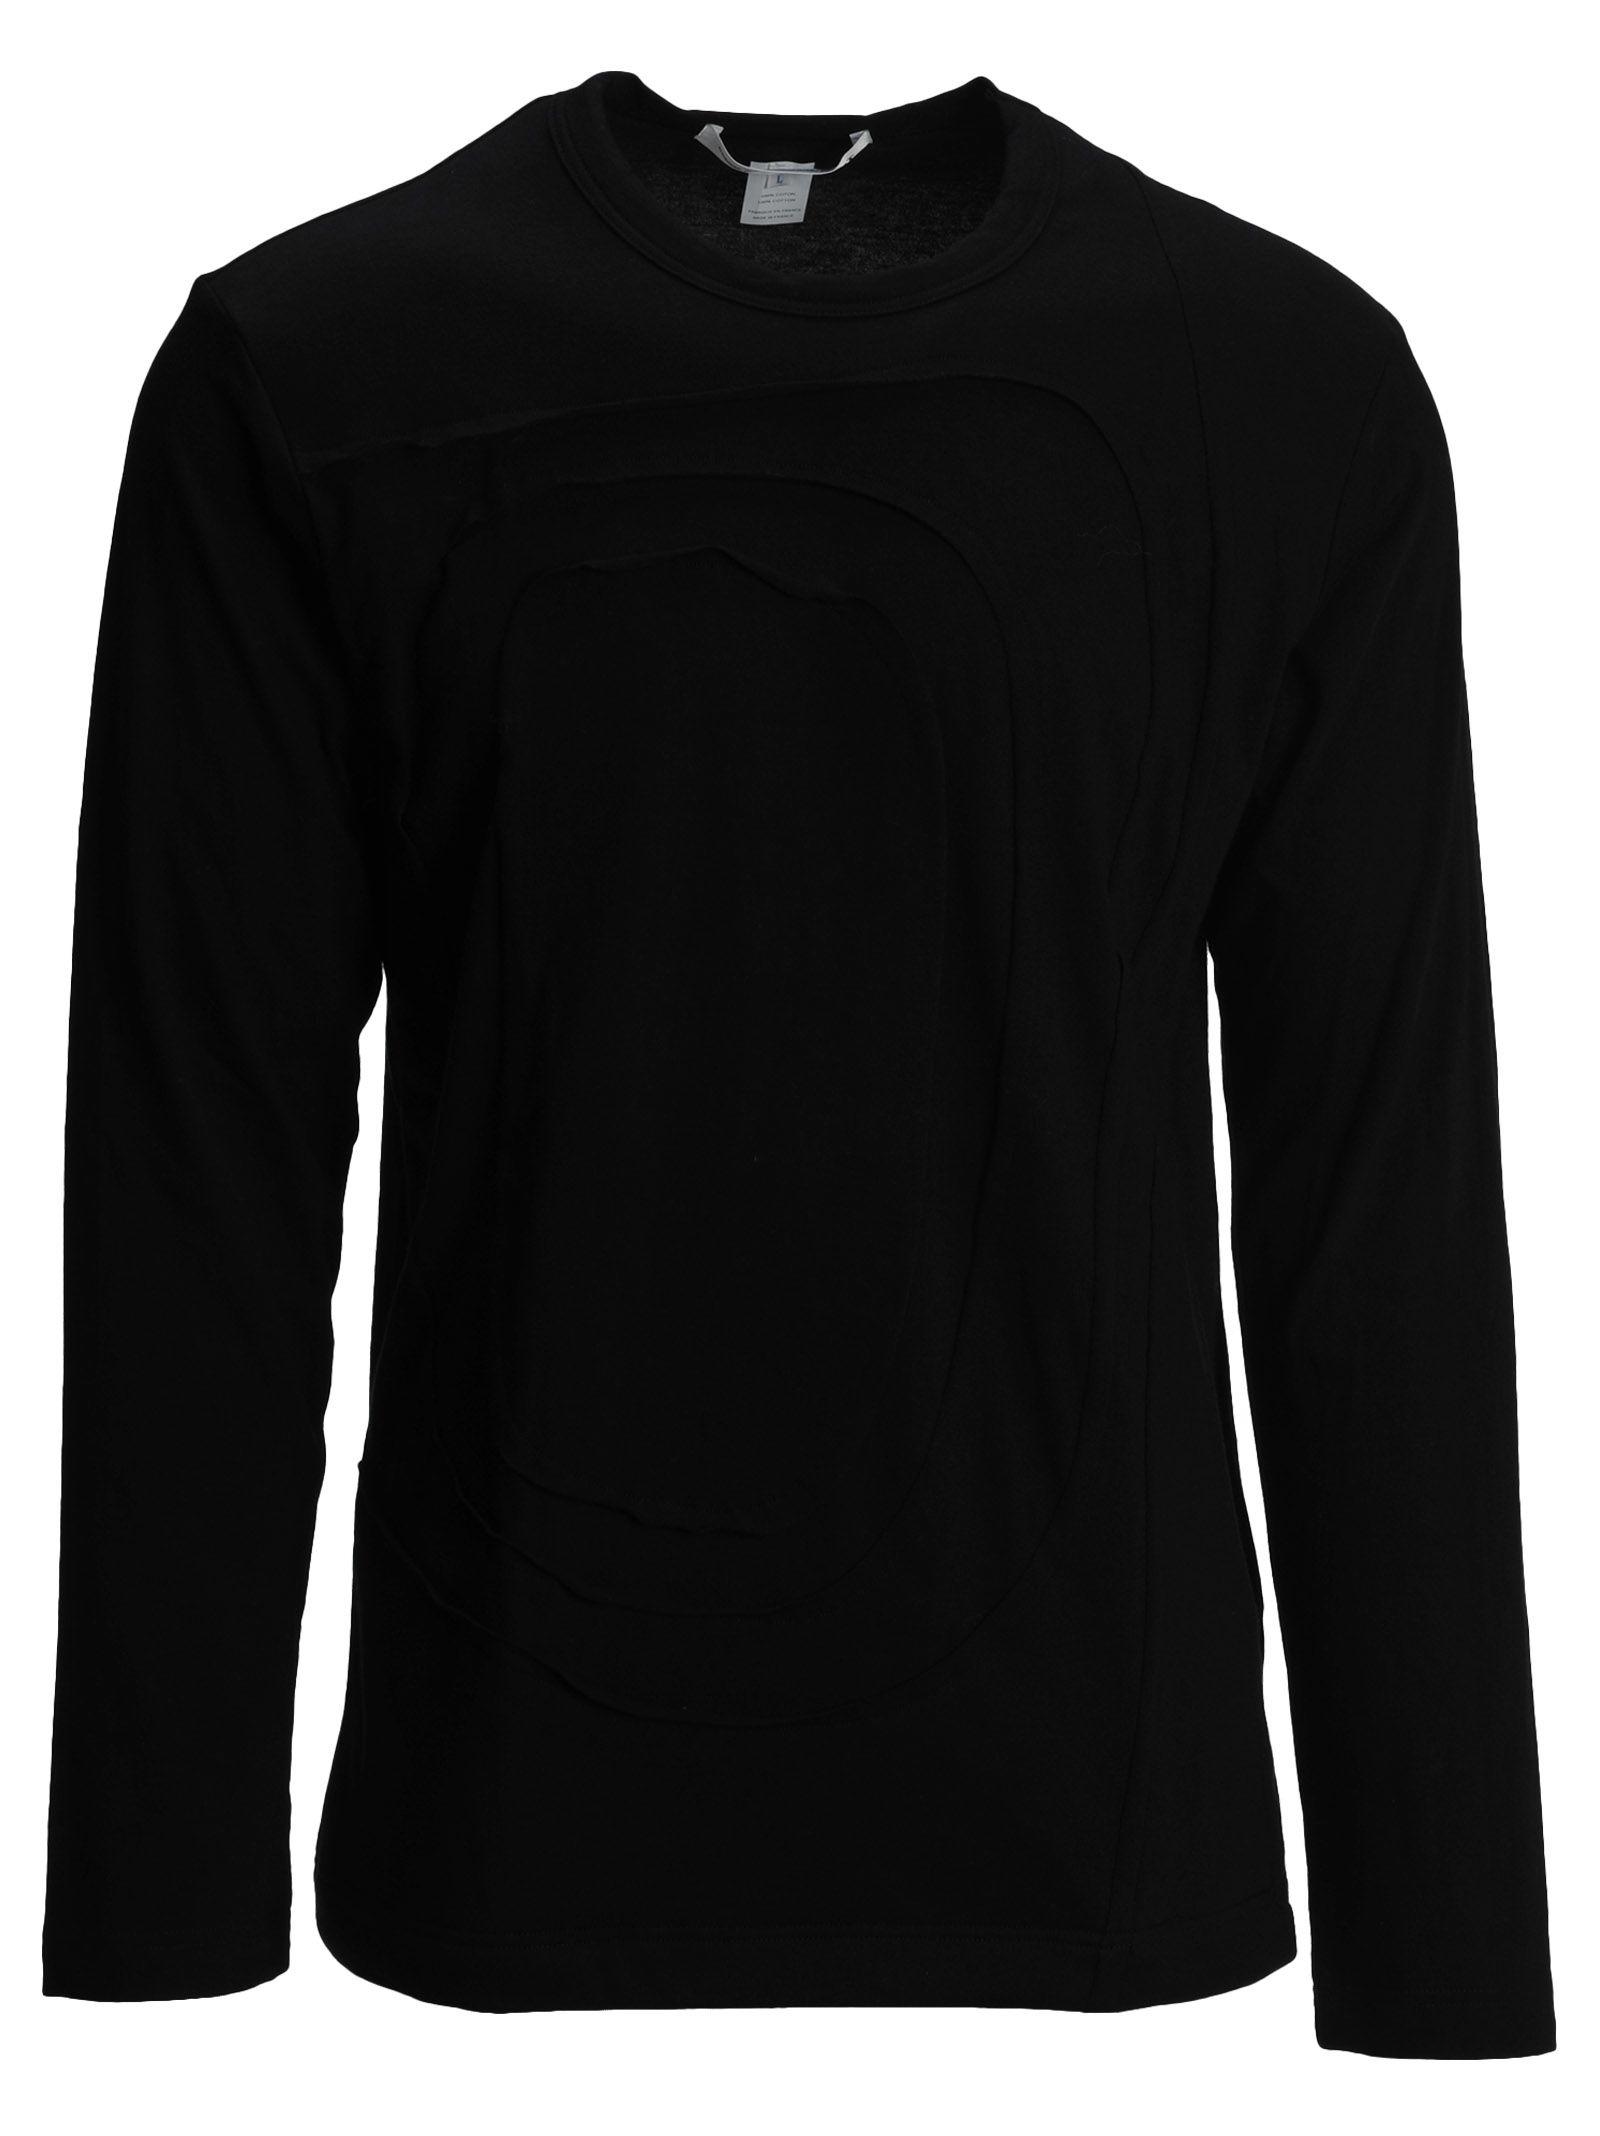 COMME DES GARÇONS BOYS Comme Des Garçons Boy Tshirt Ml Intarsia in Black